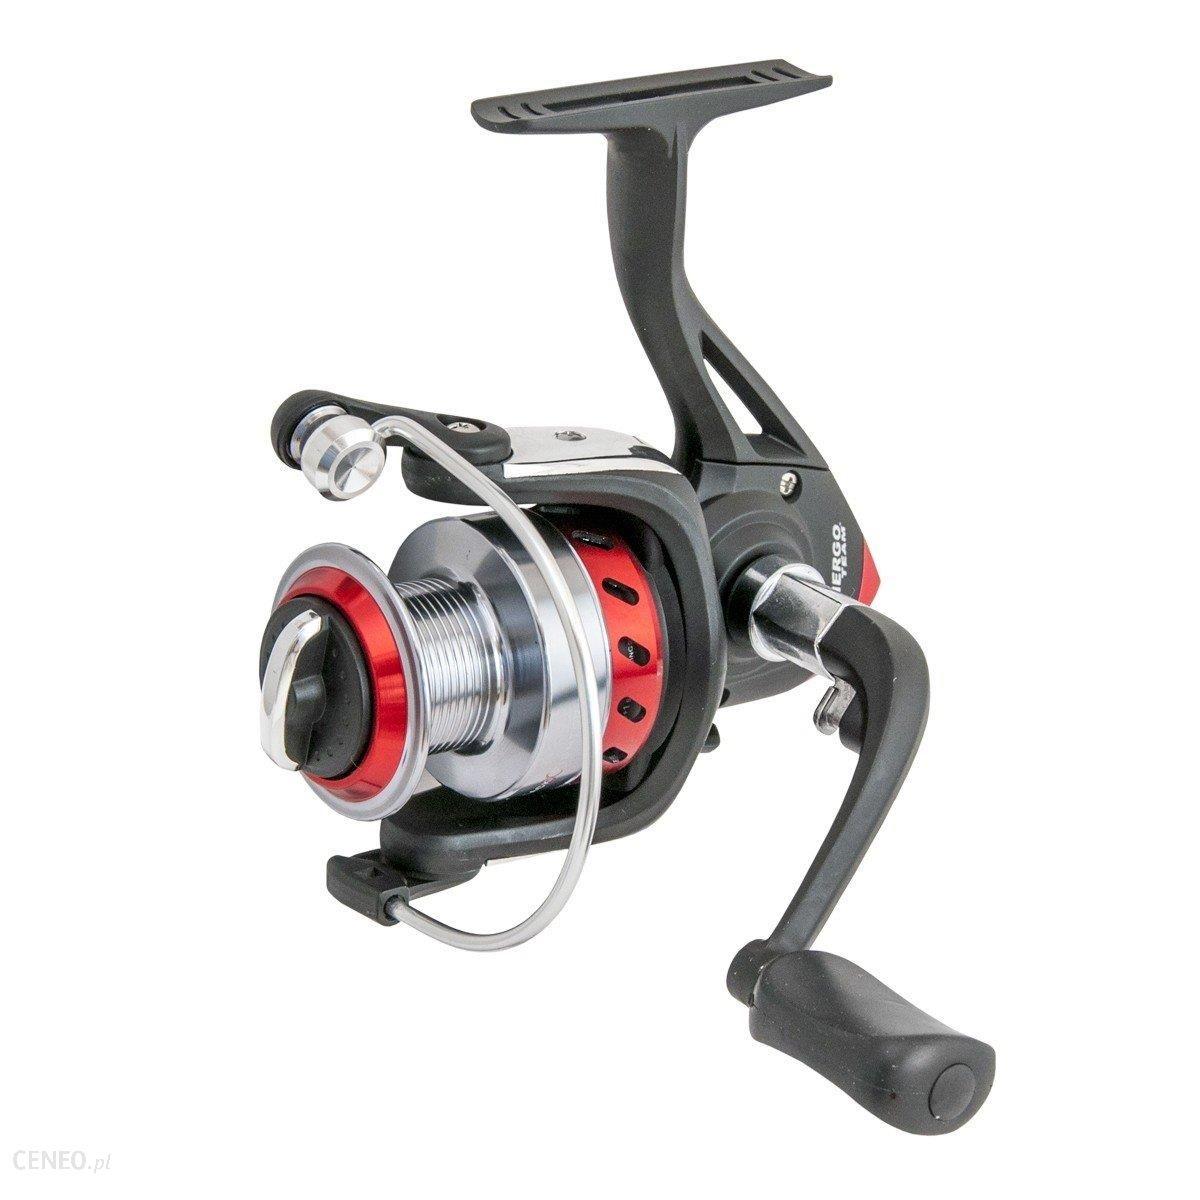 Energofish Energo Fish Spin Black Fighter 4000